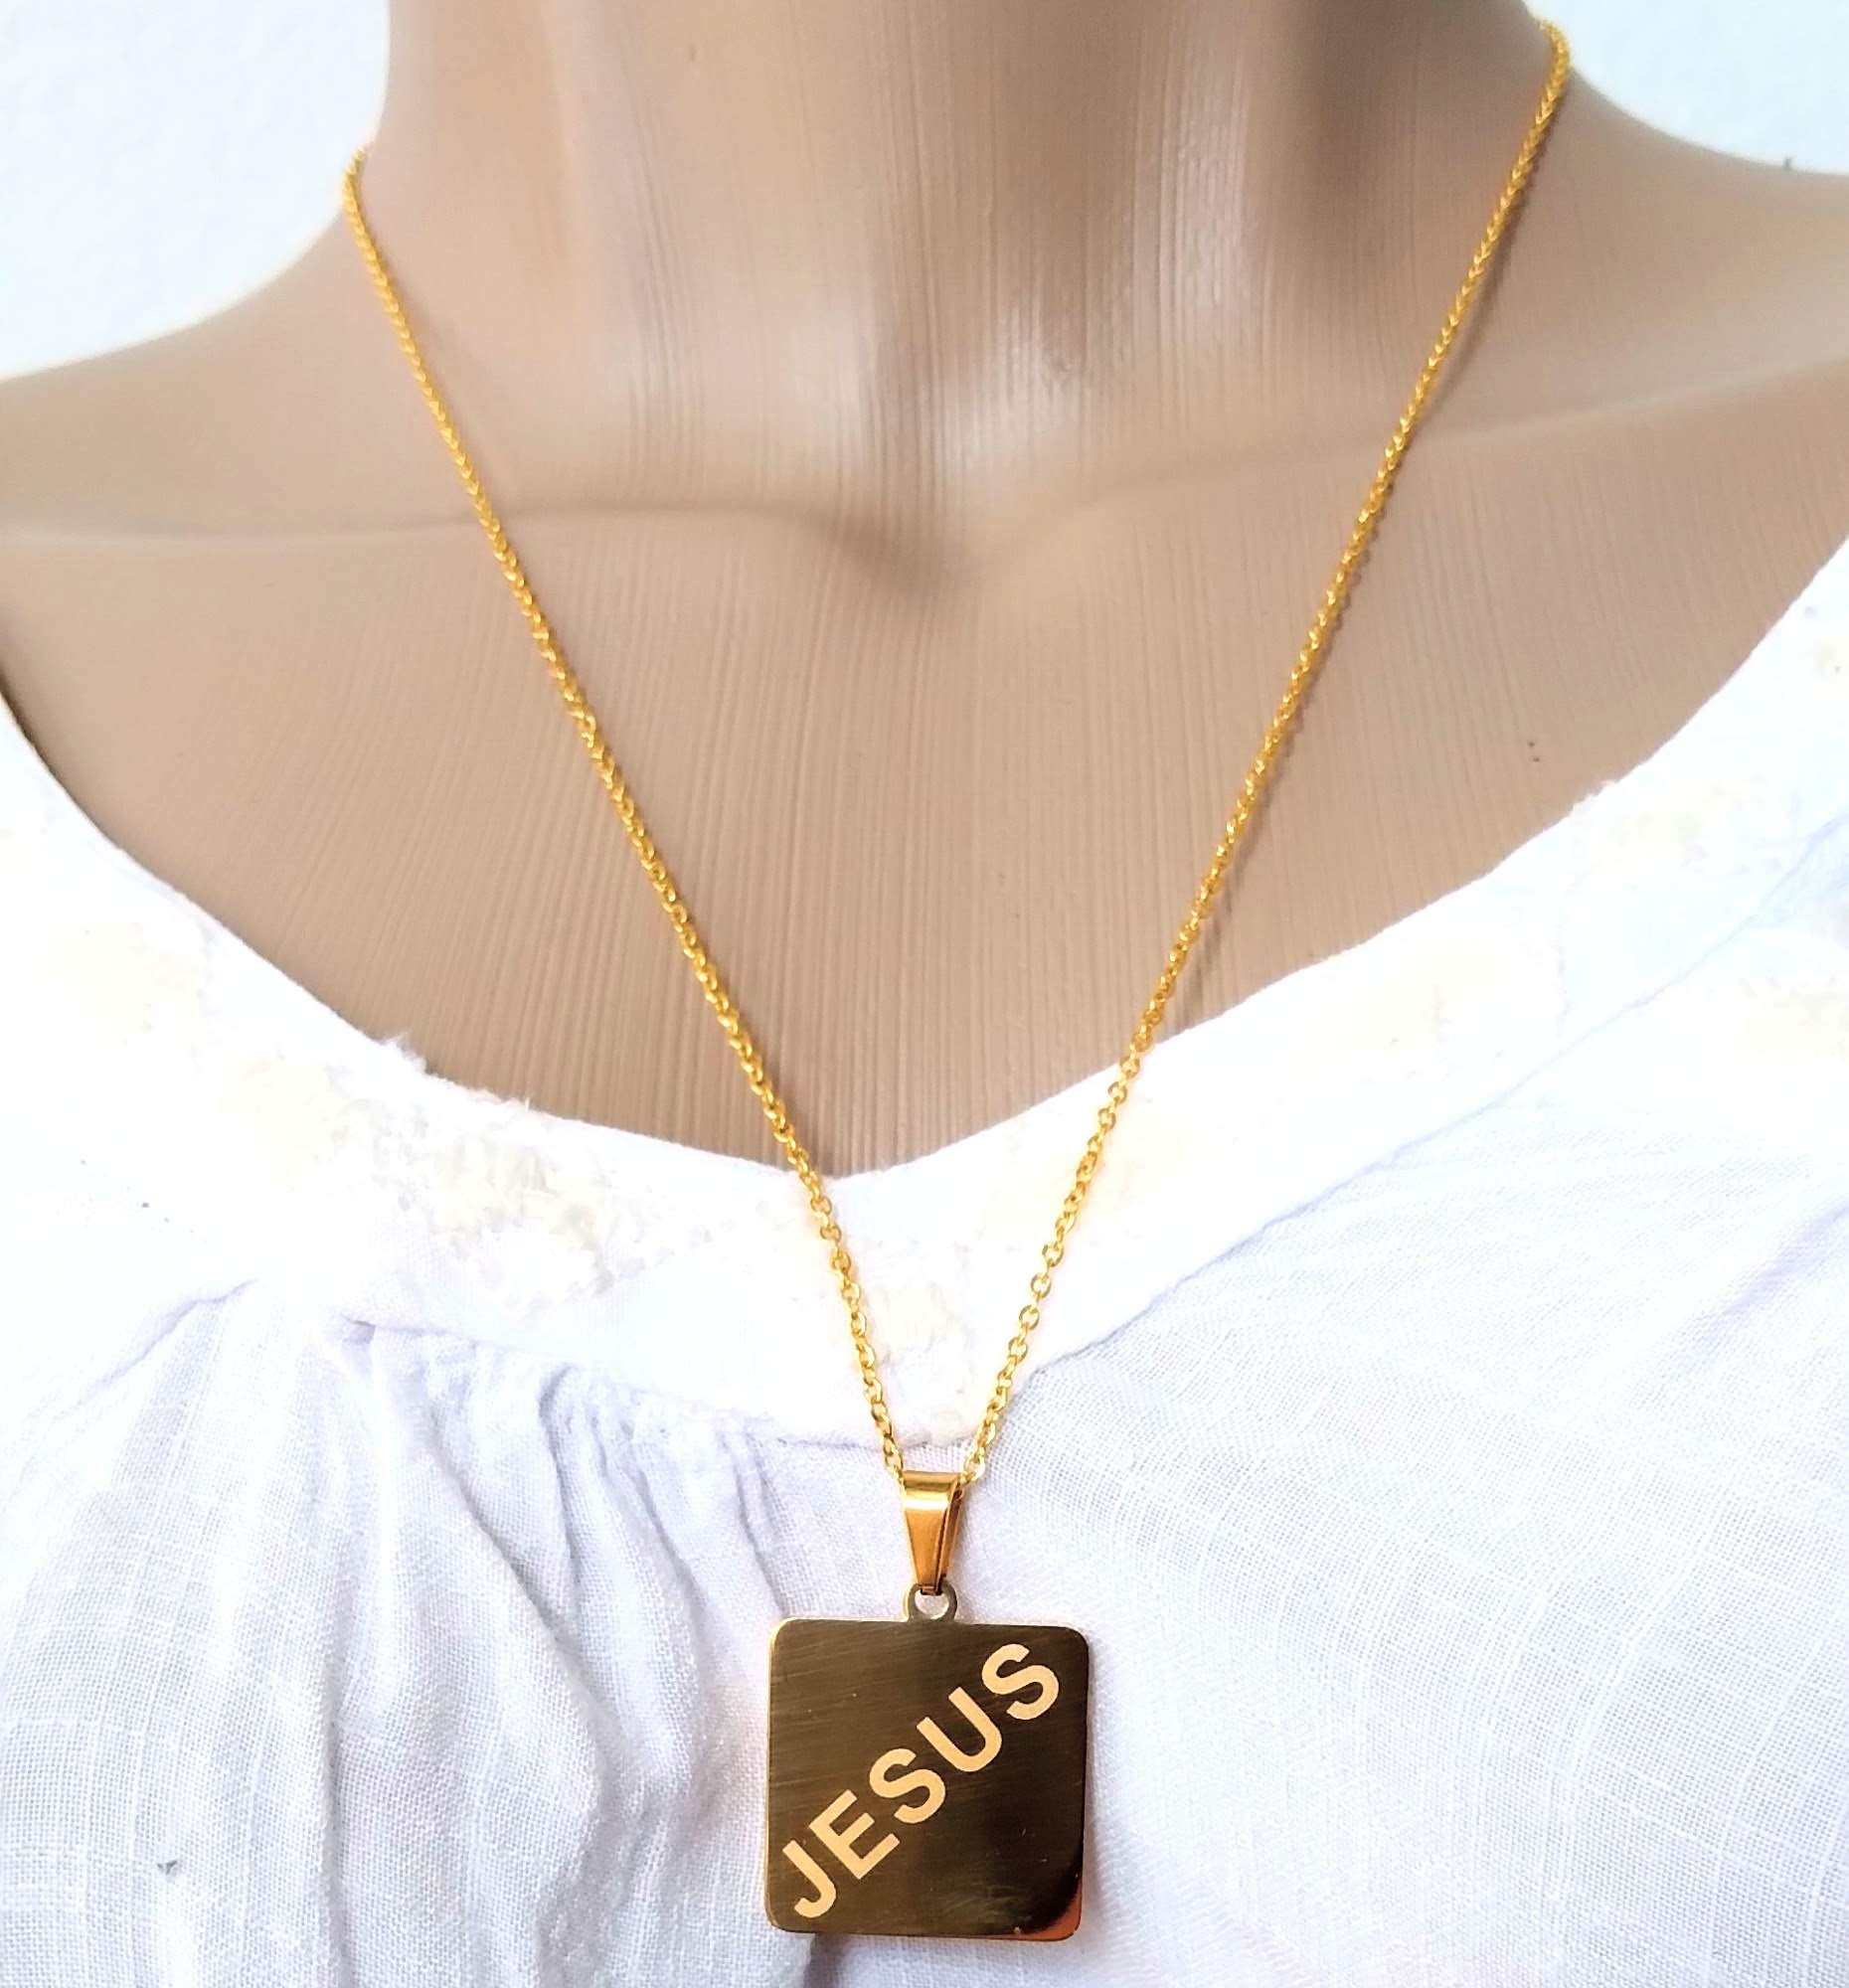 Colar Corrente Feminina Placa Jesus Banhada ouro 18k